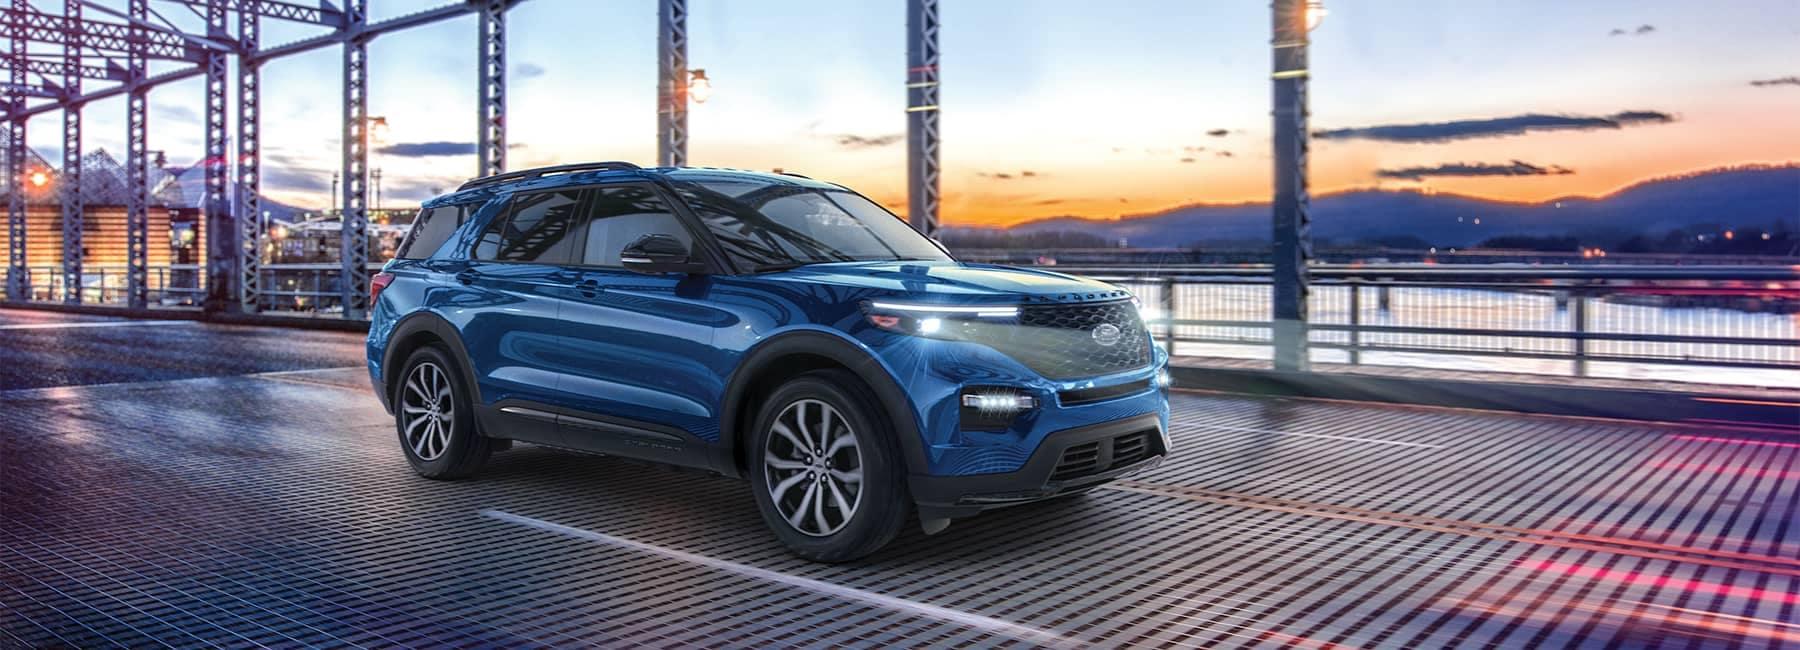 Blue 2021 Ford Explorer crossing a suburban bridge_mobile